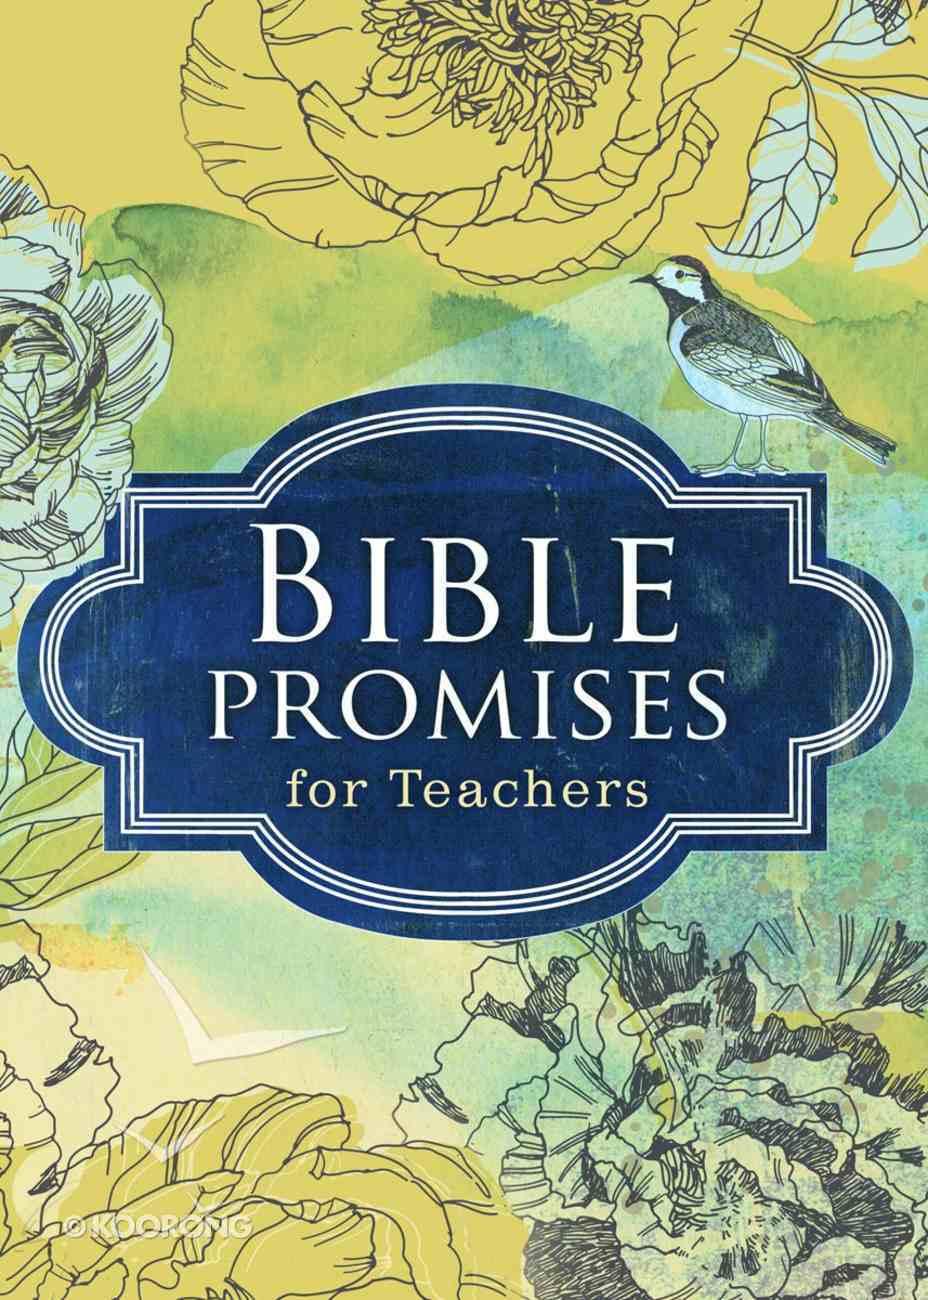 Bible Promises For Teachers (Hcsb) Hardback